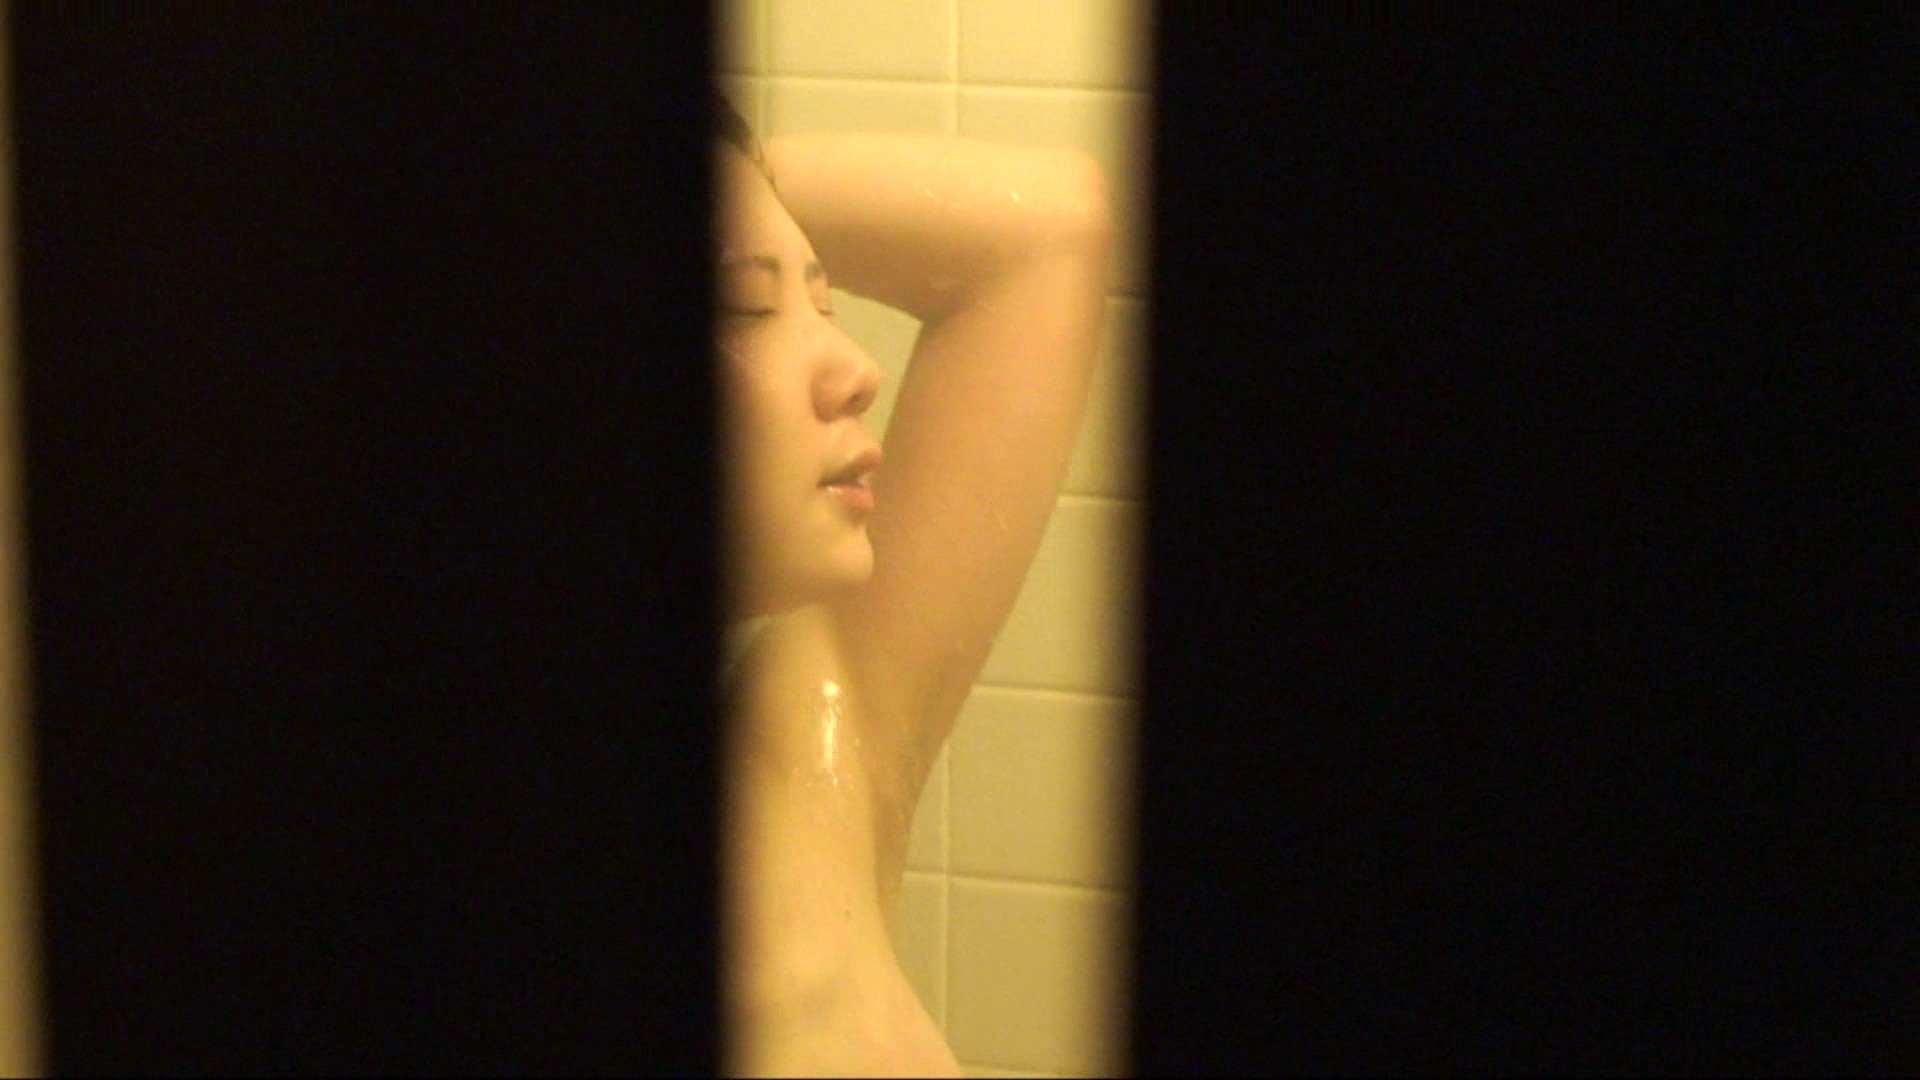 vol.02超可愛すぎる彼女の裸体をハイビジョンで!至近距離での眺め最高! エッチな盗撮 オマンコ動画キャプチャ 78pic 27